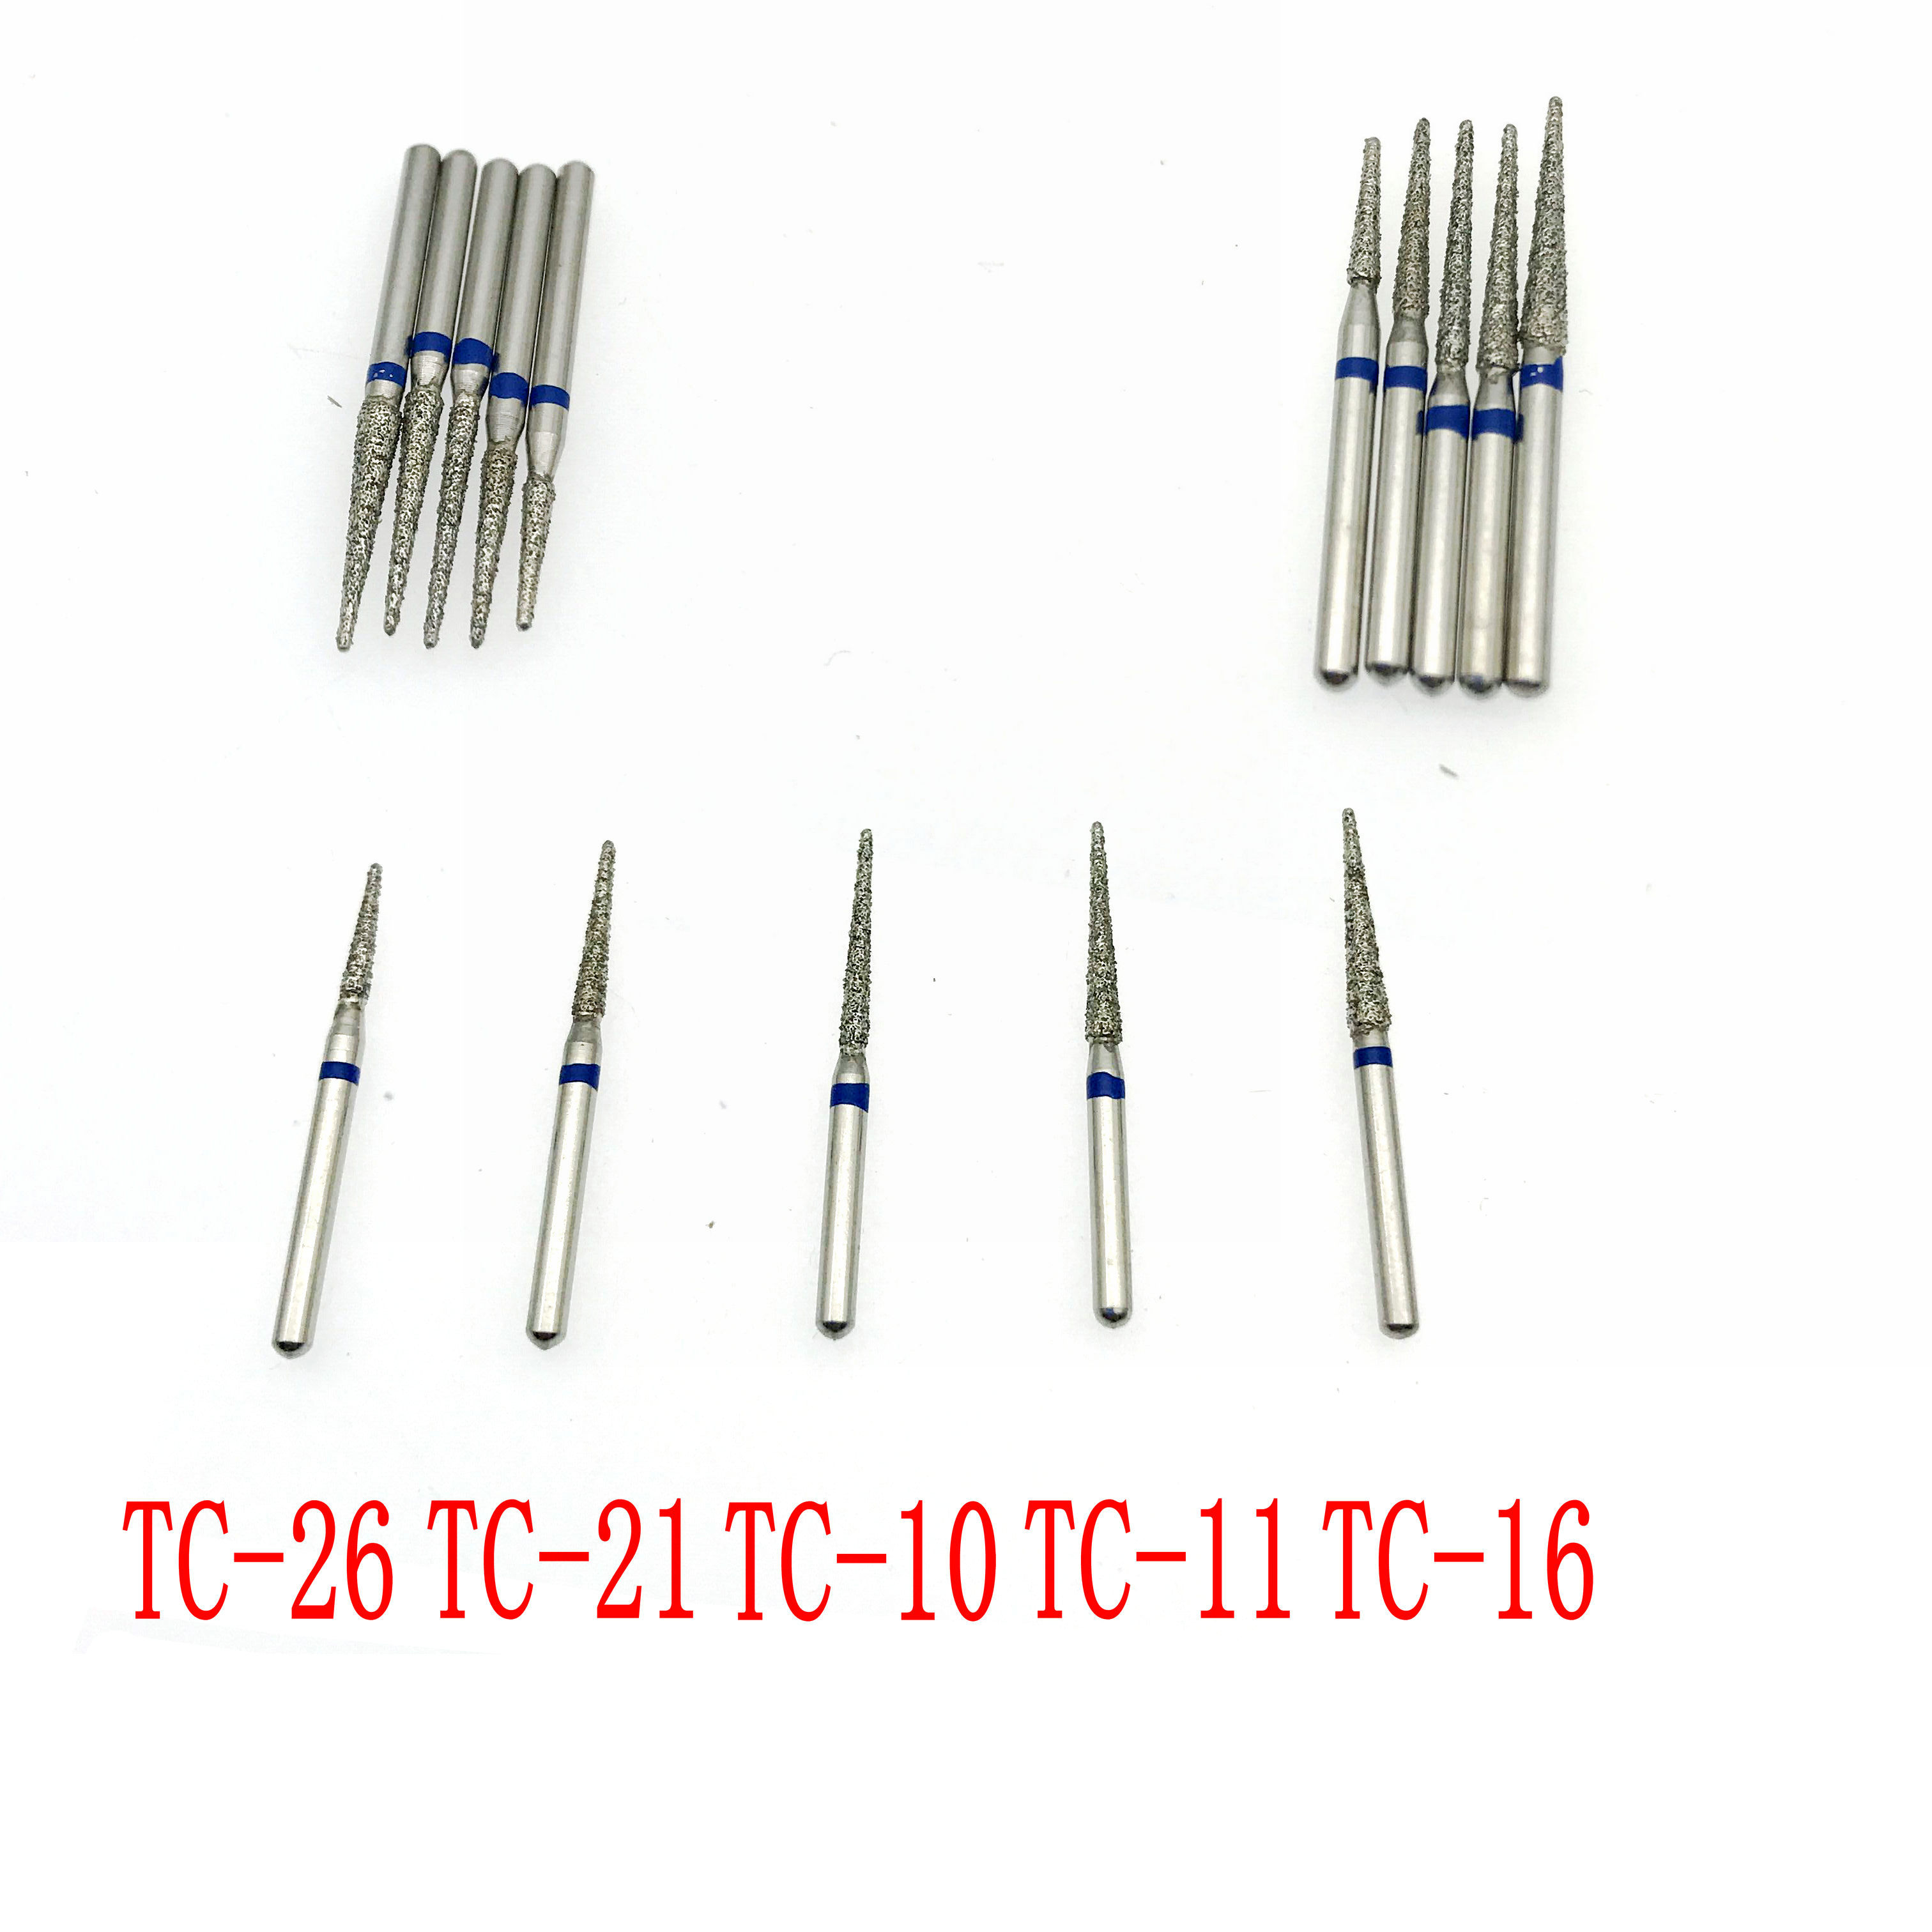 50pcs Dental Diamond Burs TC Series Dental High Speed Handpiece Burs TC26/TC21/TC10/TC11/TC16